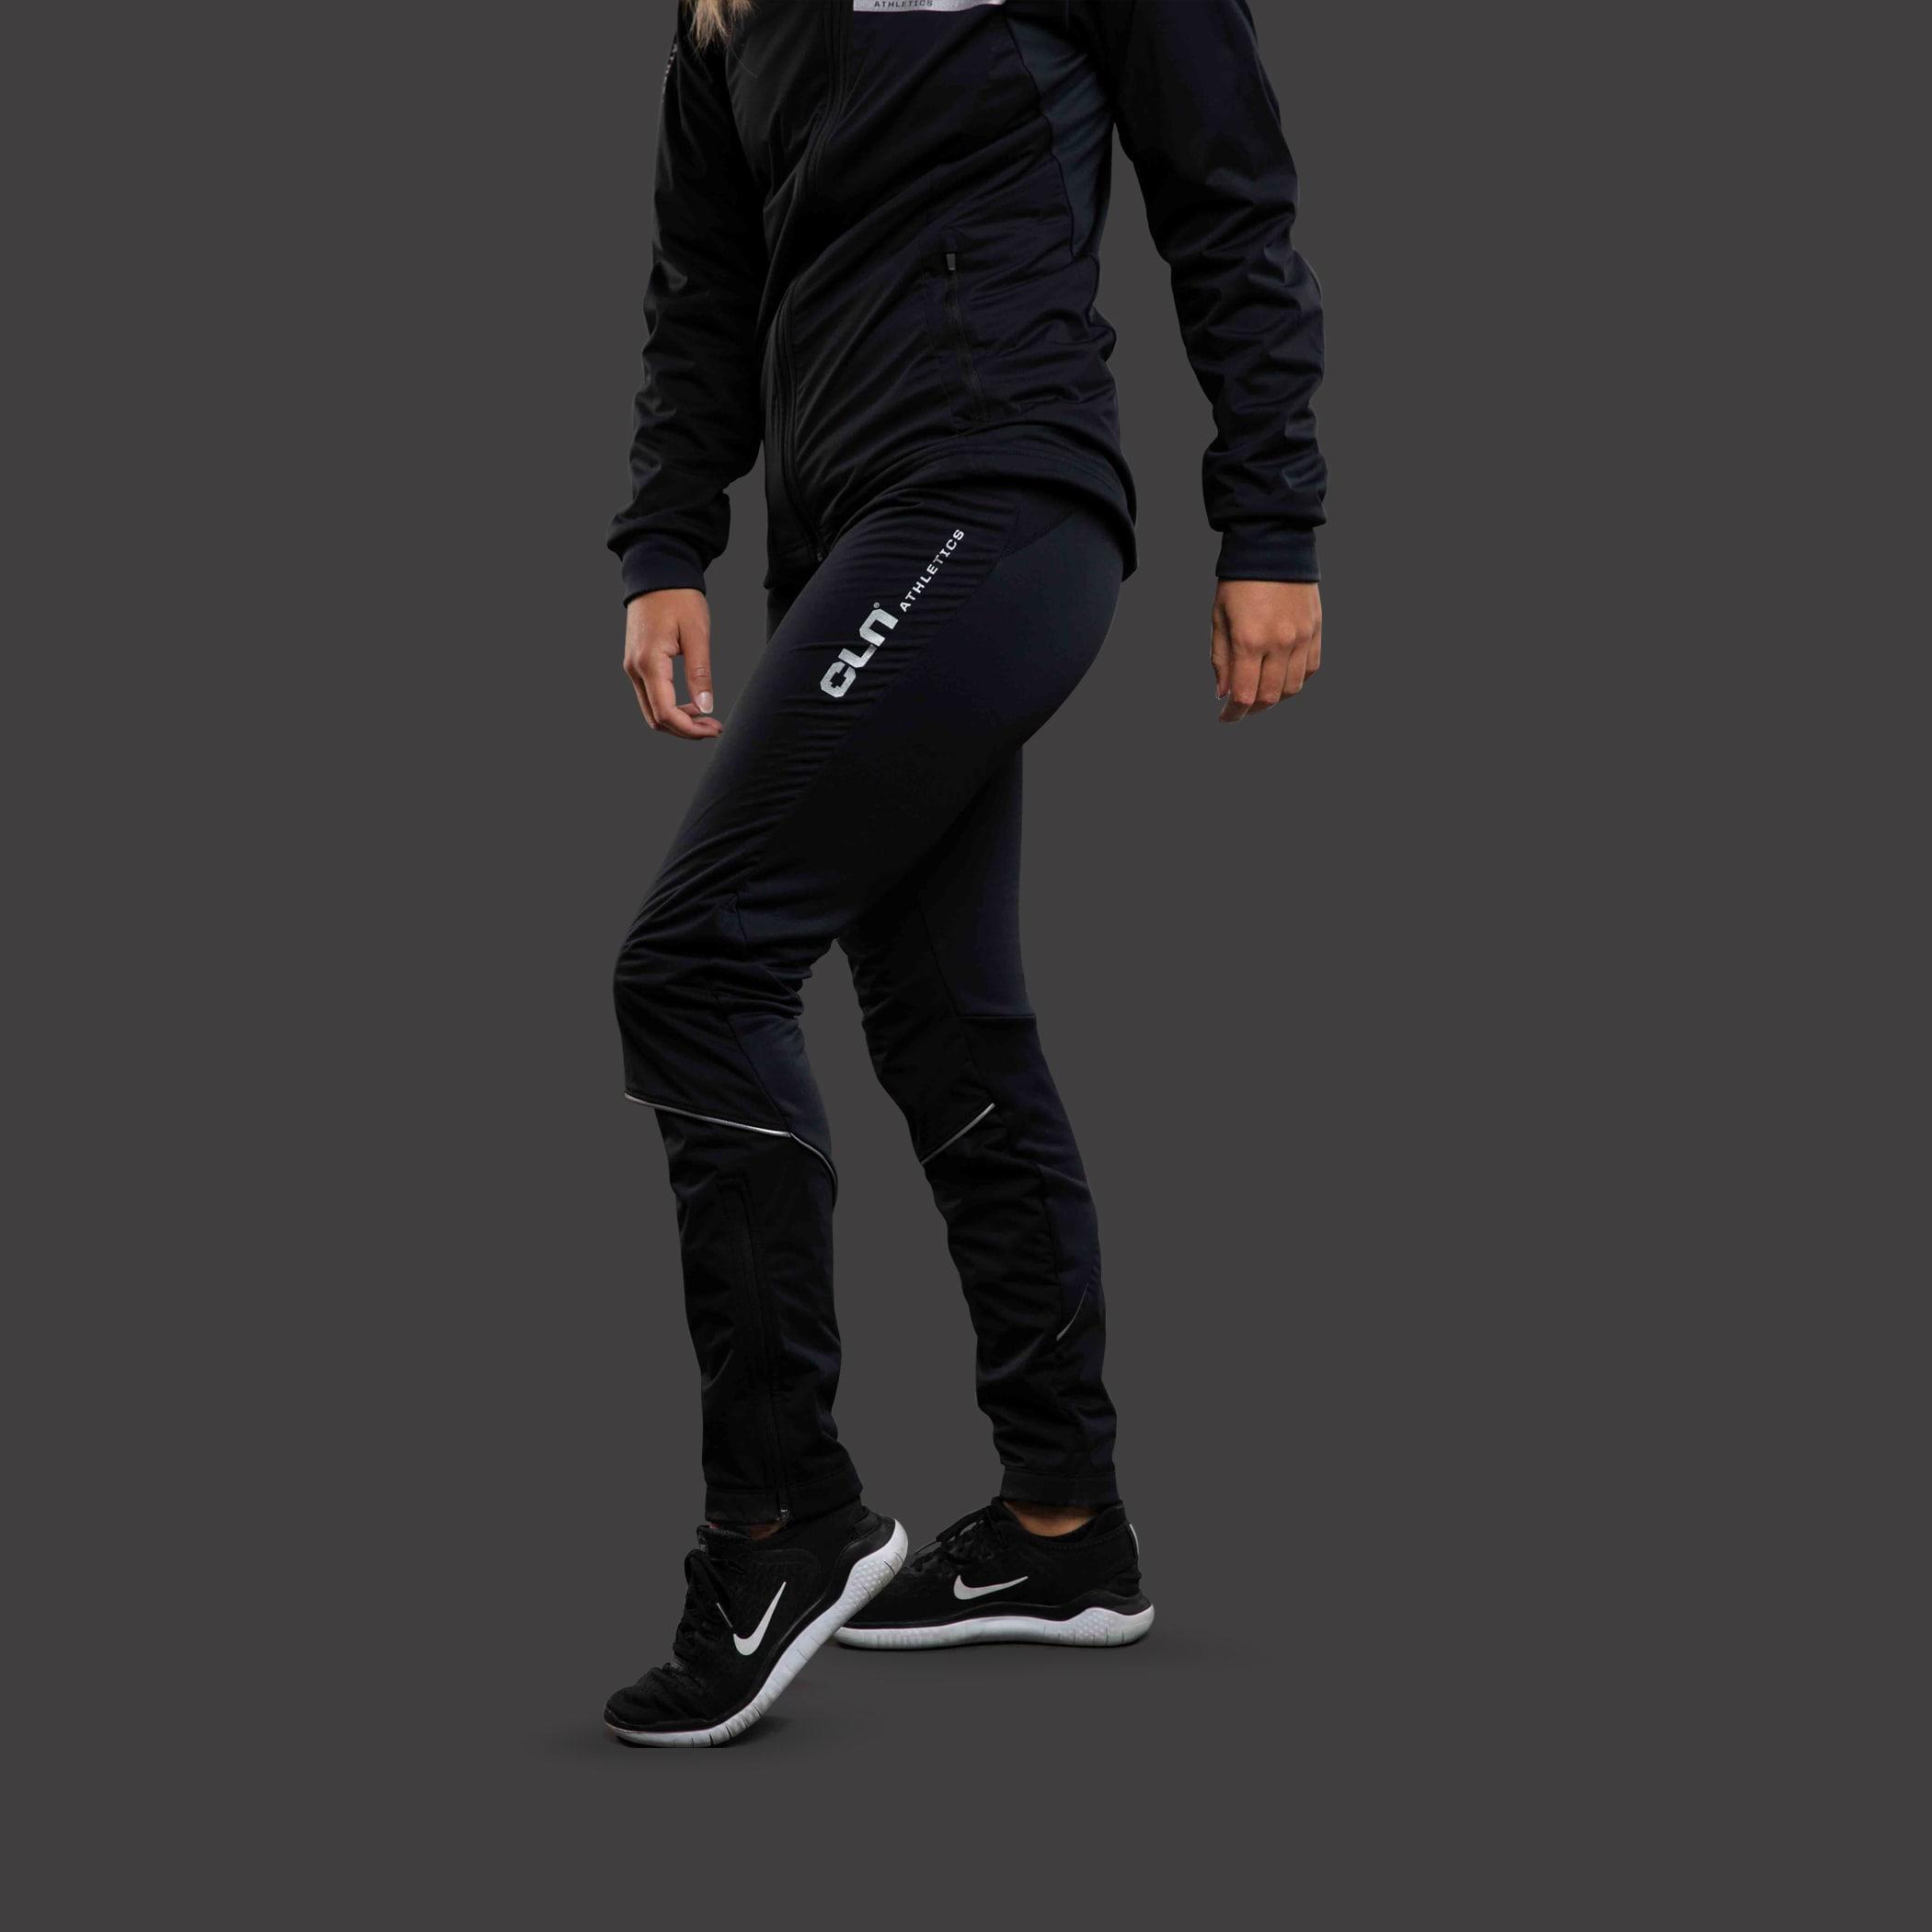 CLN Lova ws stretch pant Black